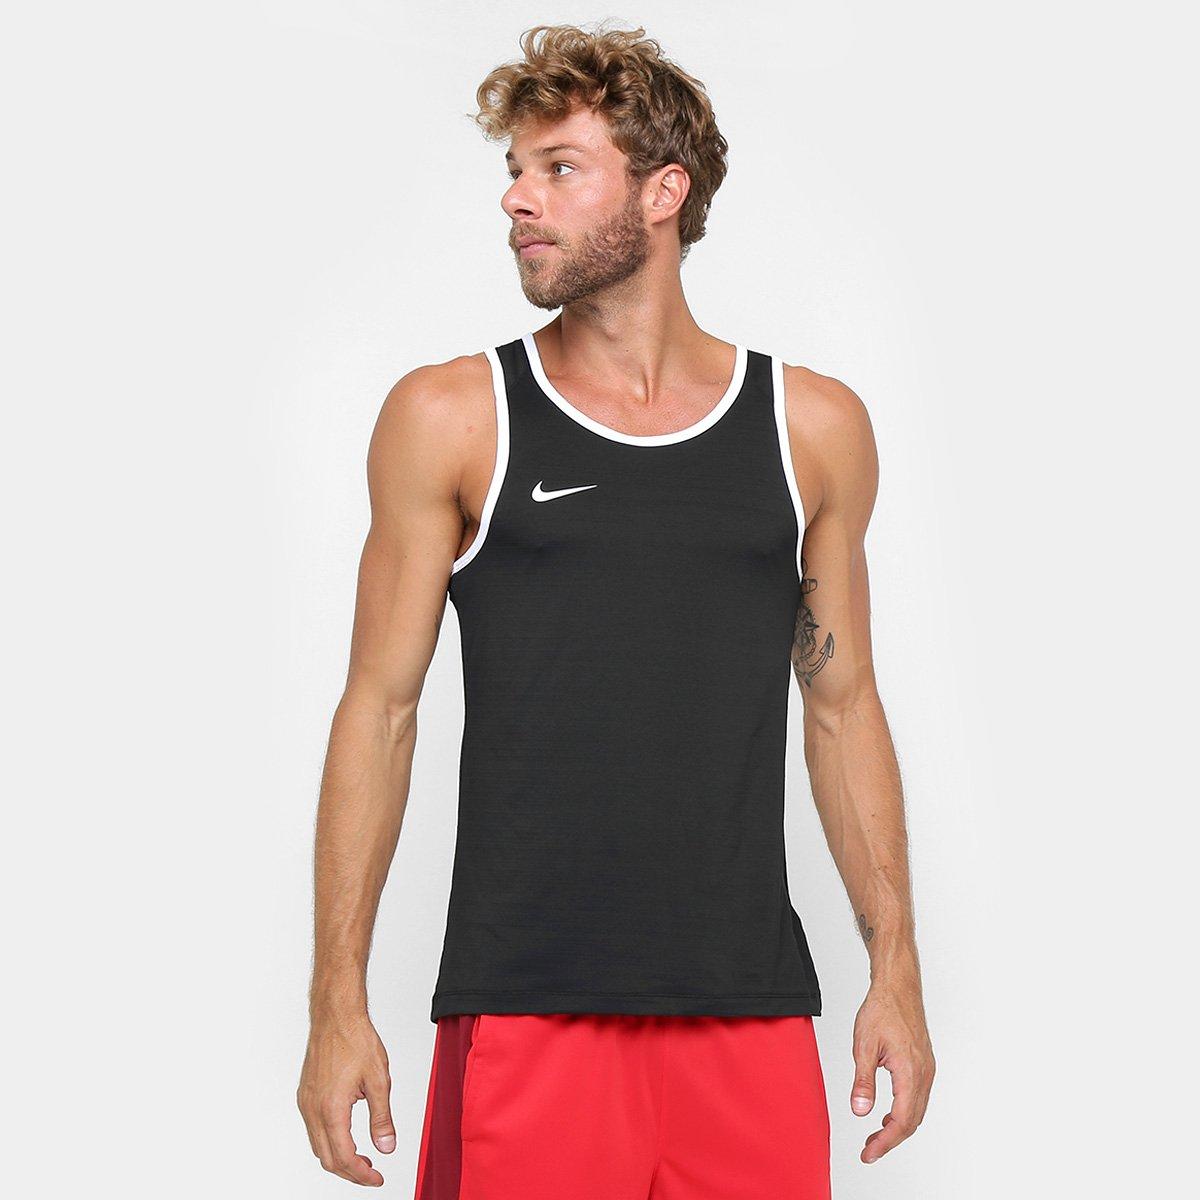 Camiseta Regata Nike SL Crossover - Preto - Compre Agora  028ca5537ea6c